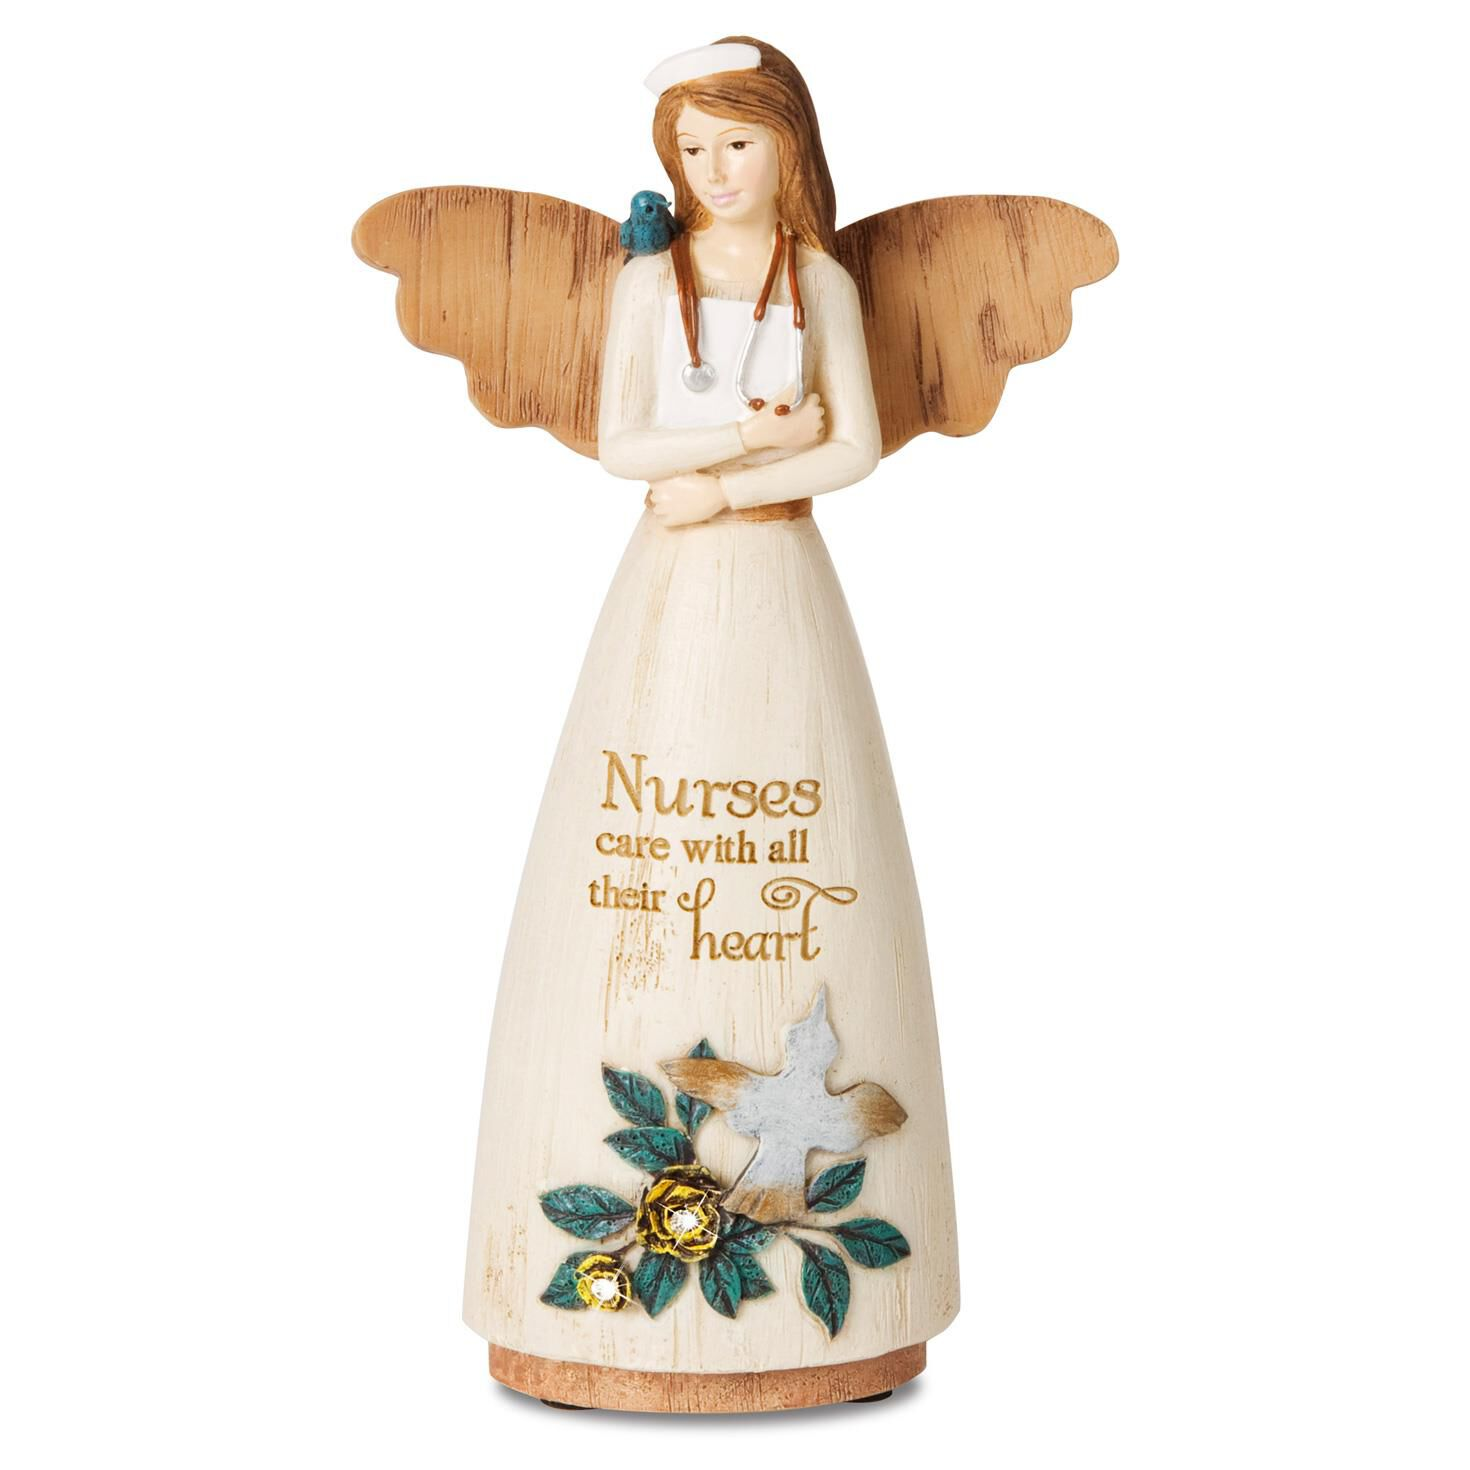 nurses care with all their heart angel figurine figurines hallmark